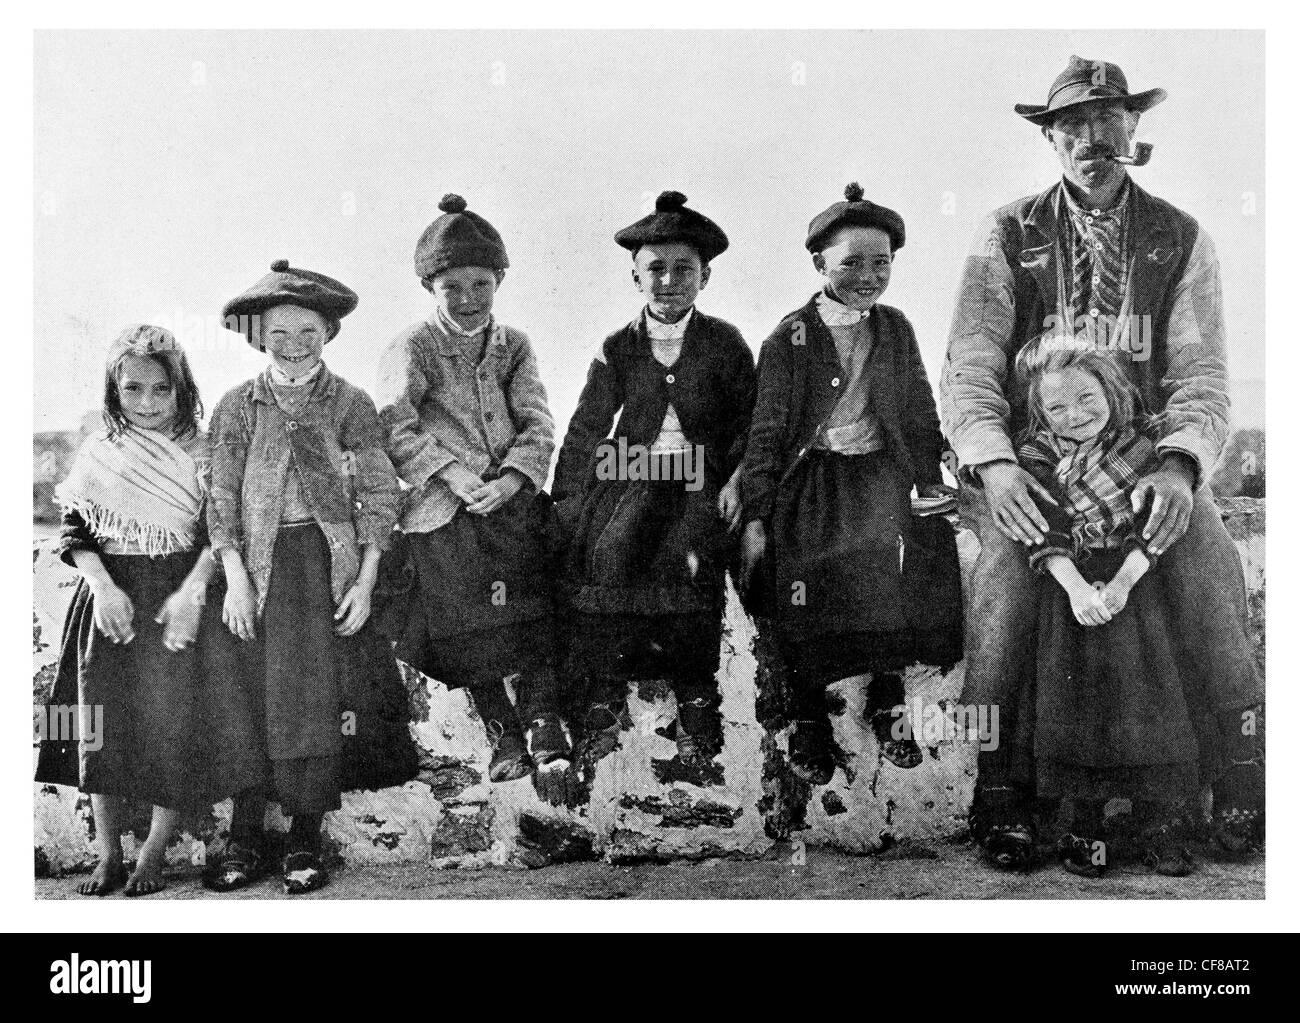 1927 Aran Islanders Children Scotland - Stock Image